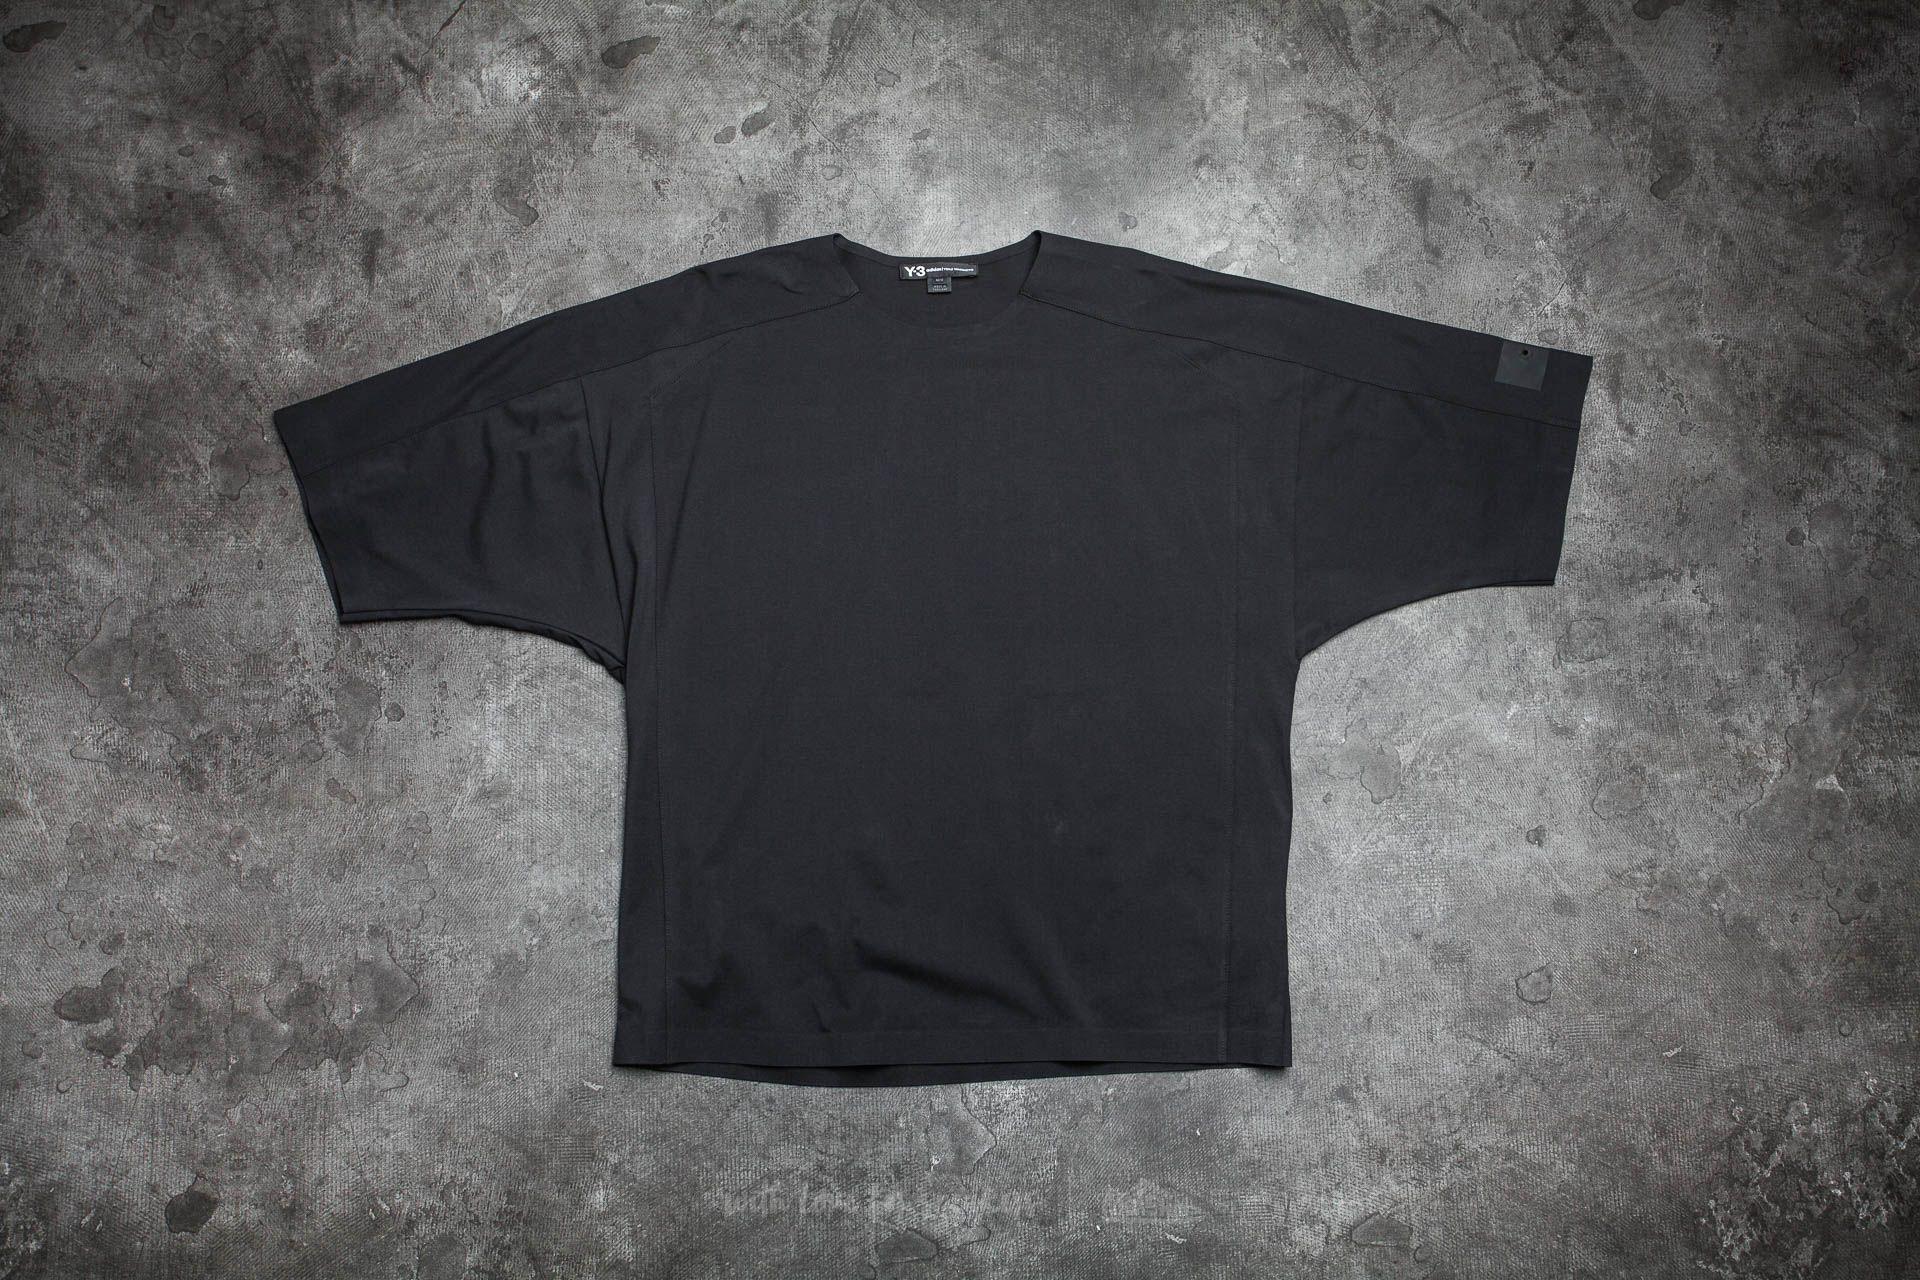 Y-3 Skylight Short Sleeve Tee Black - 14654